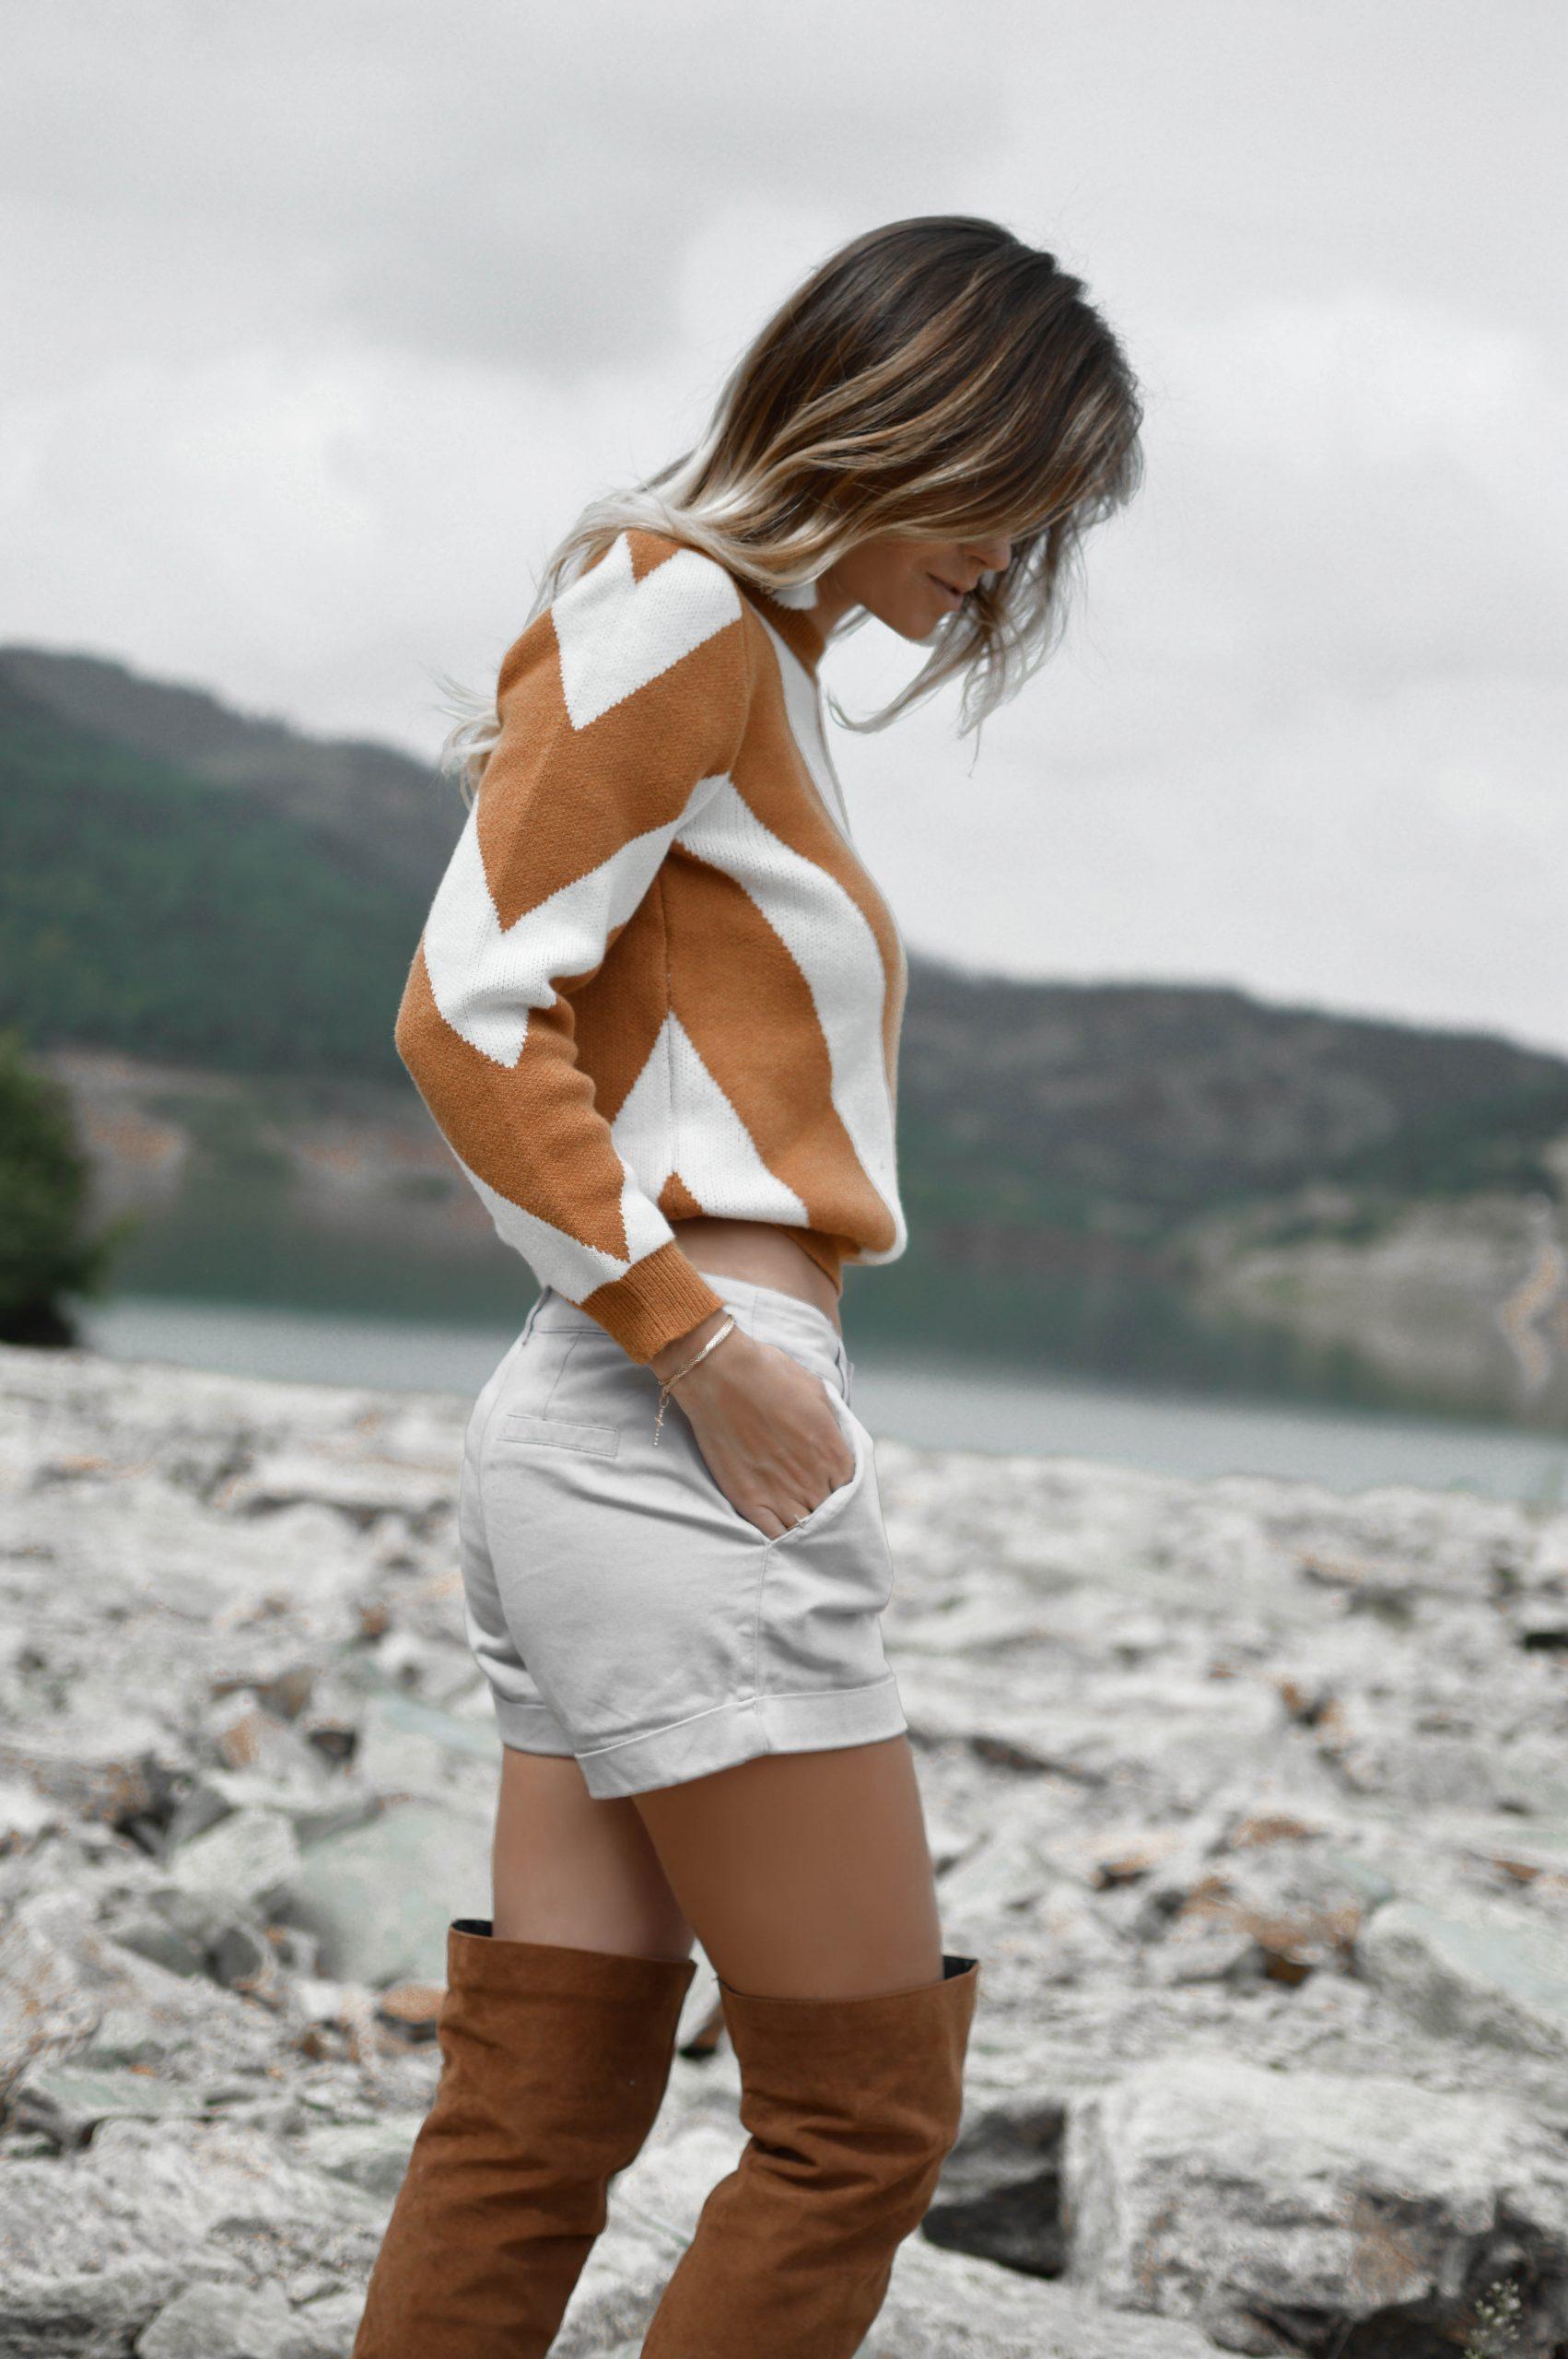 tamara-bellis-pONwcn4IcVU-unsplash